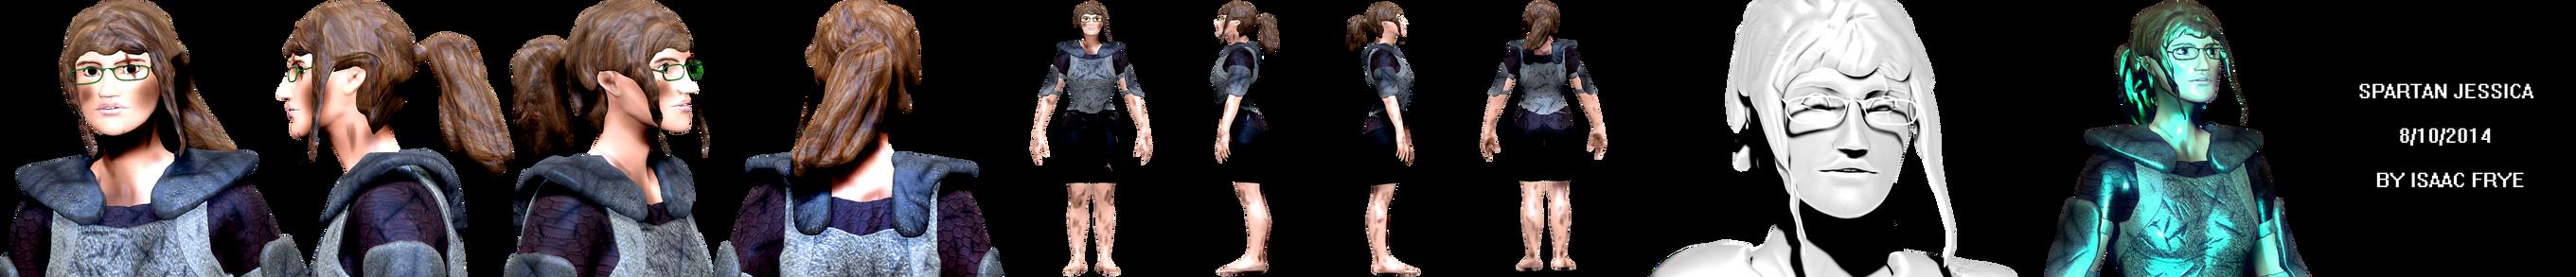 Jessica Spartan - Female Warrior 3D Model Render